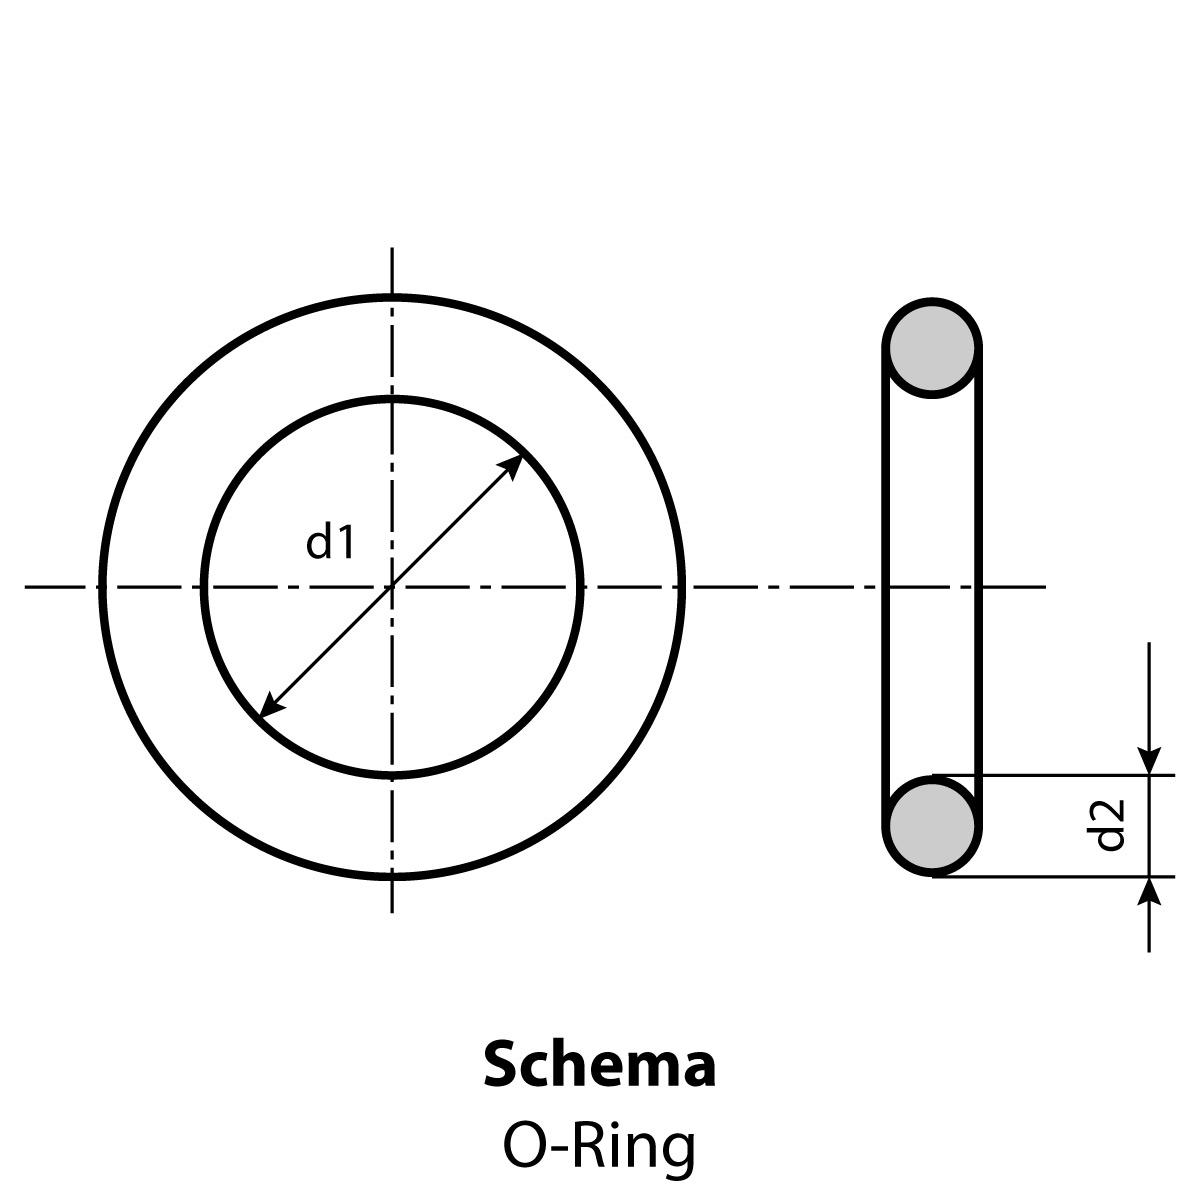 schwarz oder braun O-Ring 21 x 4 mm FKM 70 Menge 2 Stück Dichtring